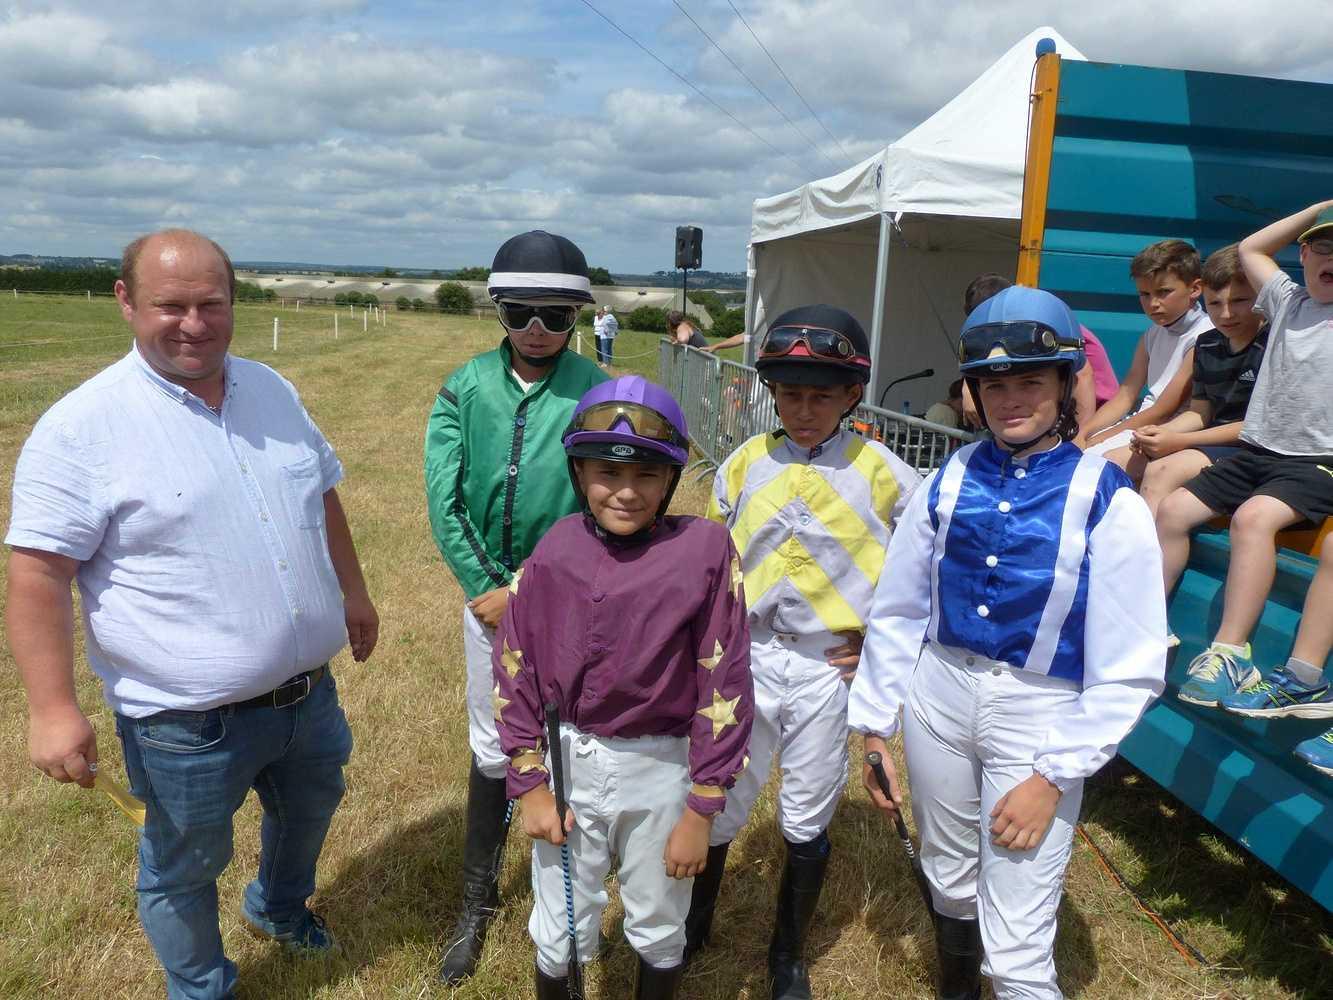 Photos des courses de poneys p1100699